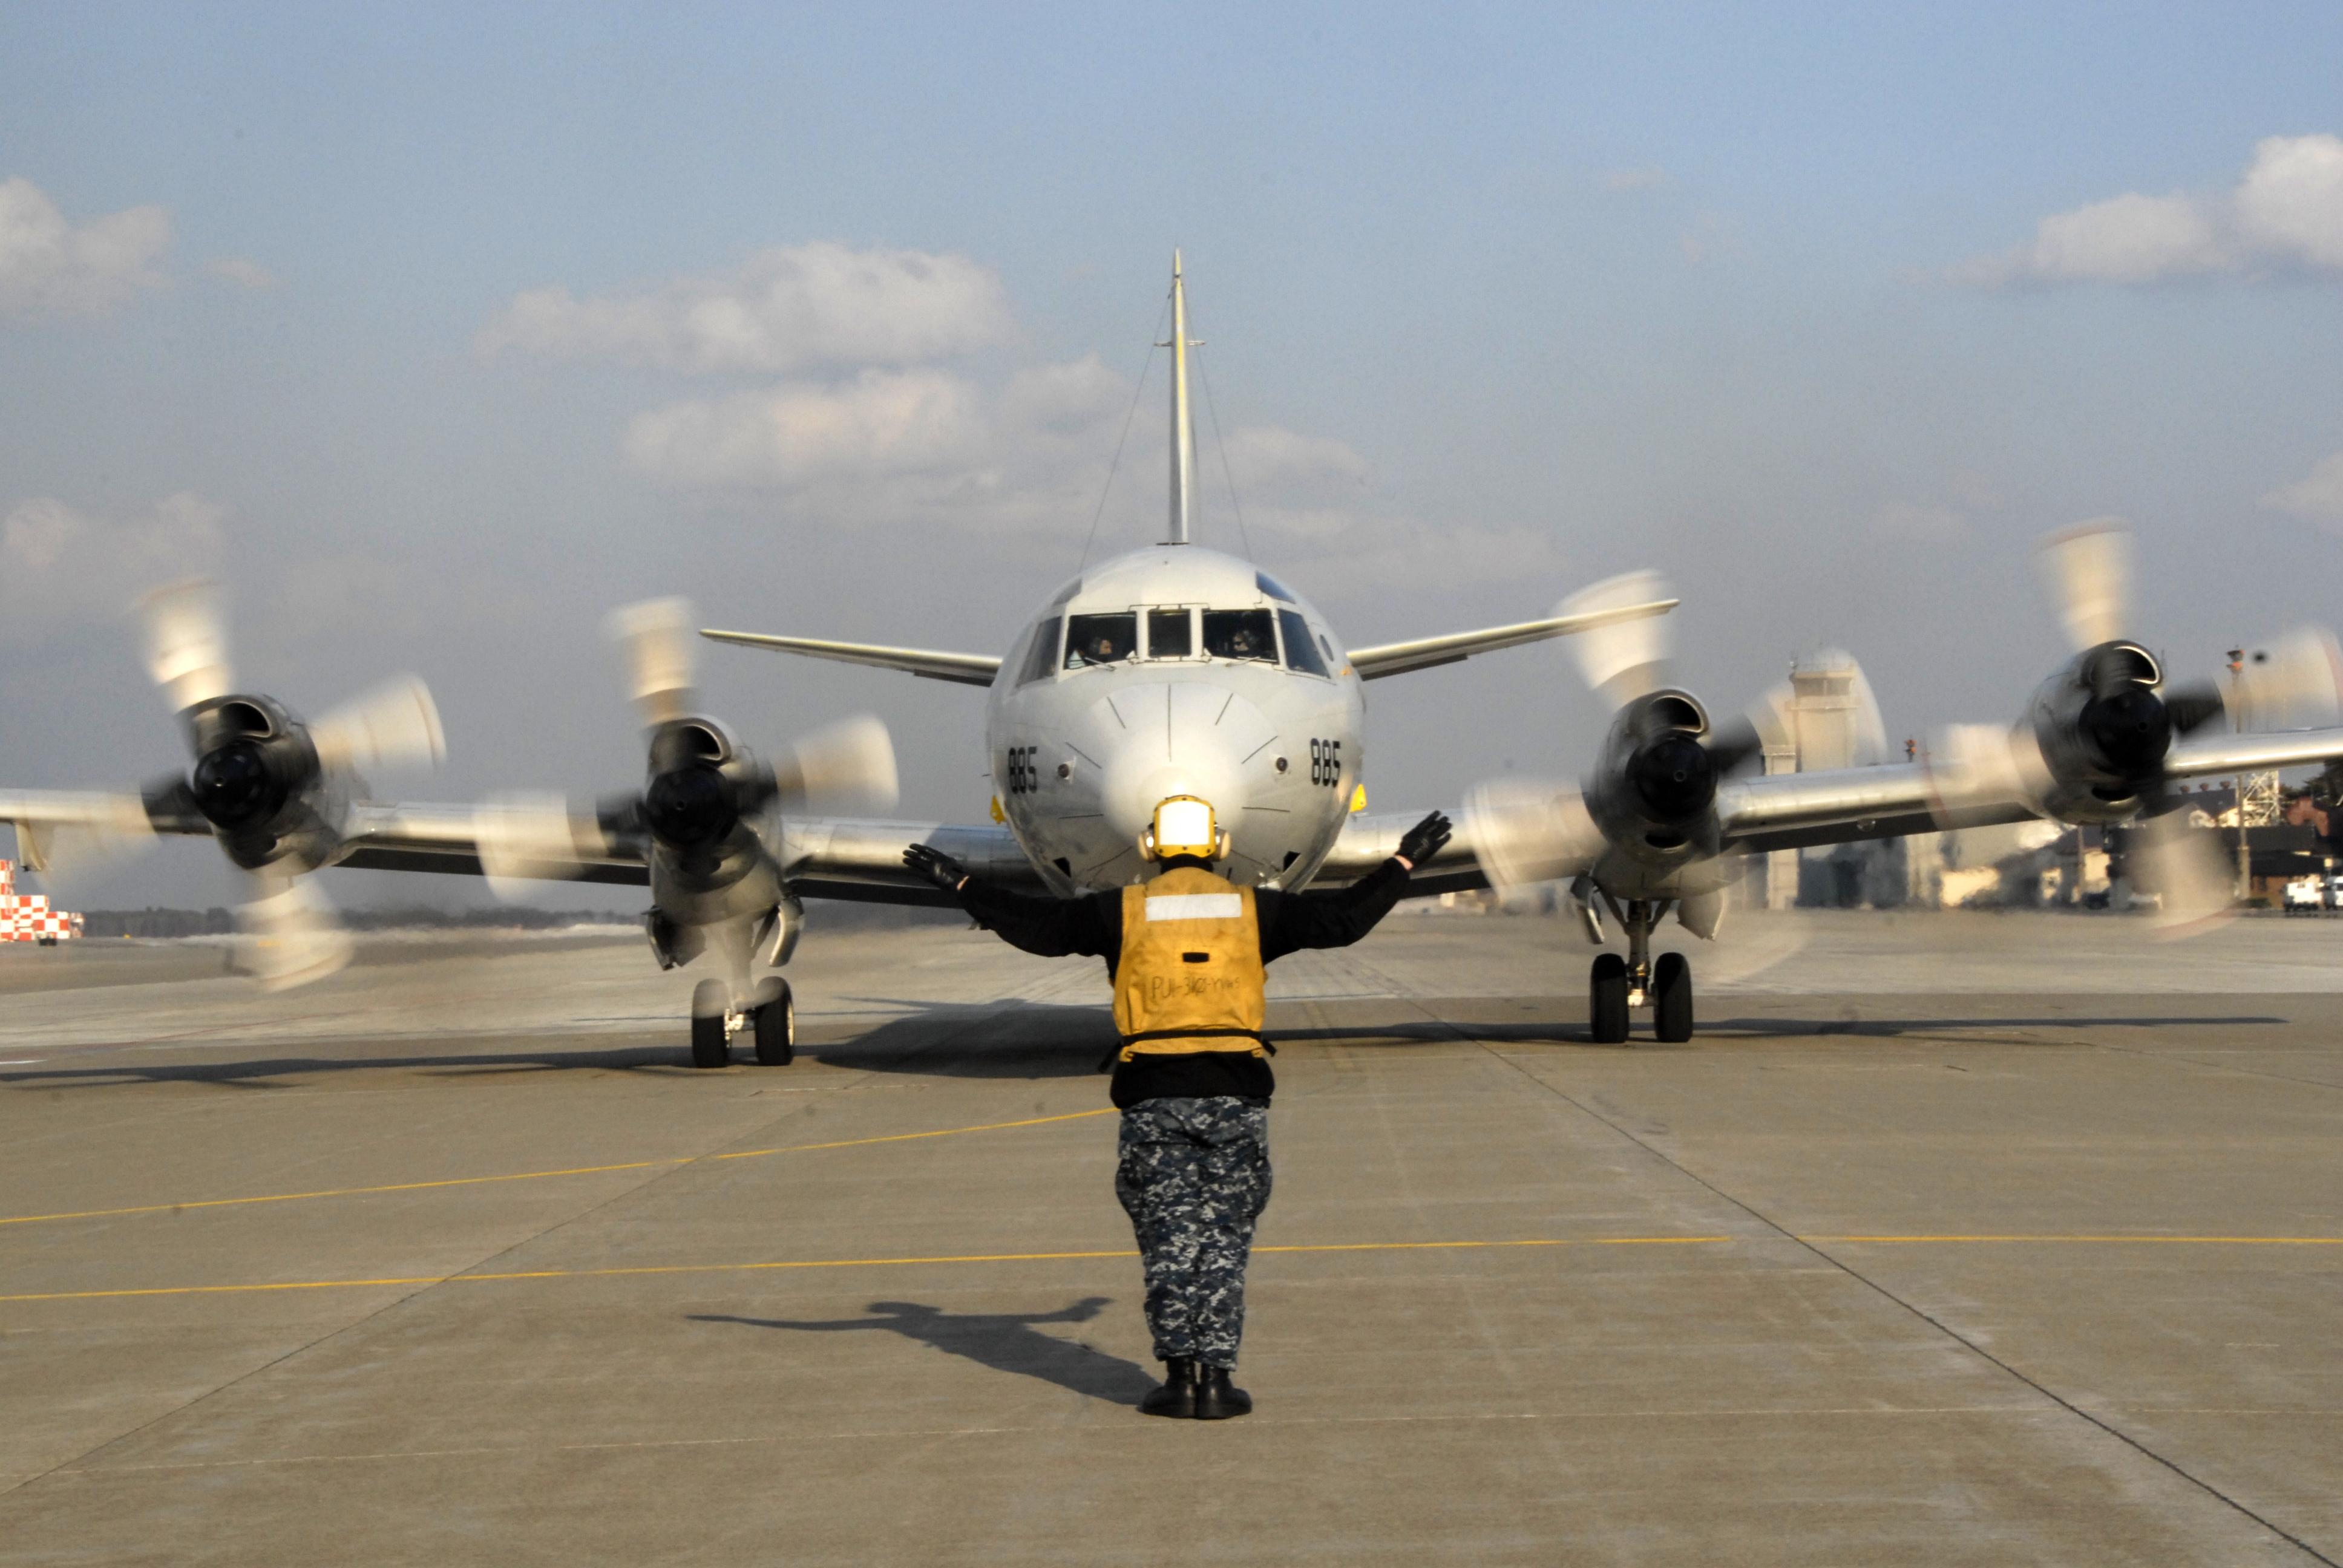 file defense gov news photo 120405 n kr471 186 u s navy airman